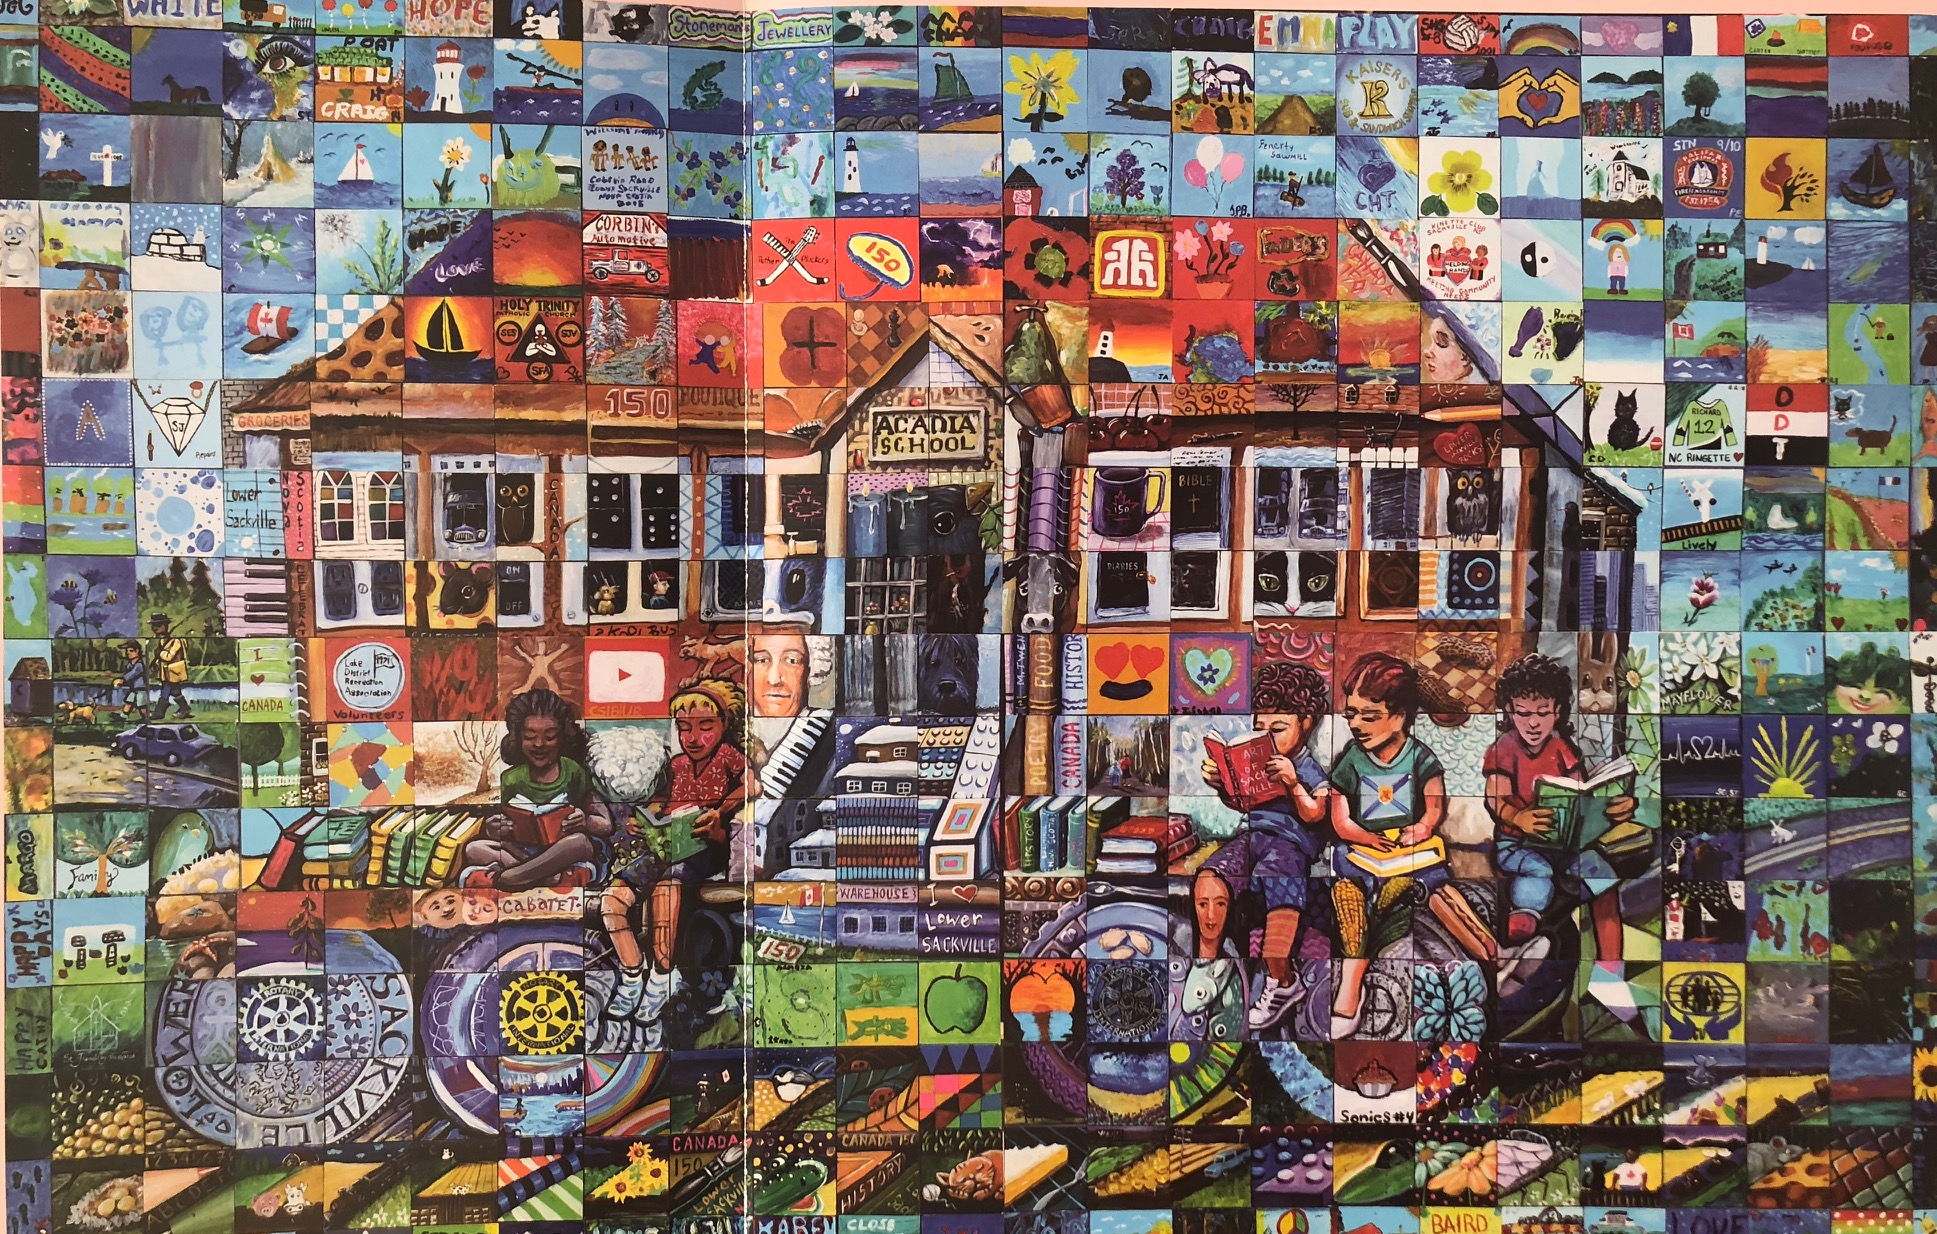 Lower Sackville Nova Scotia Canada 150 mural